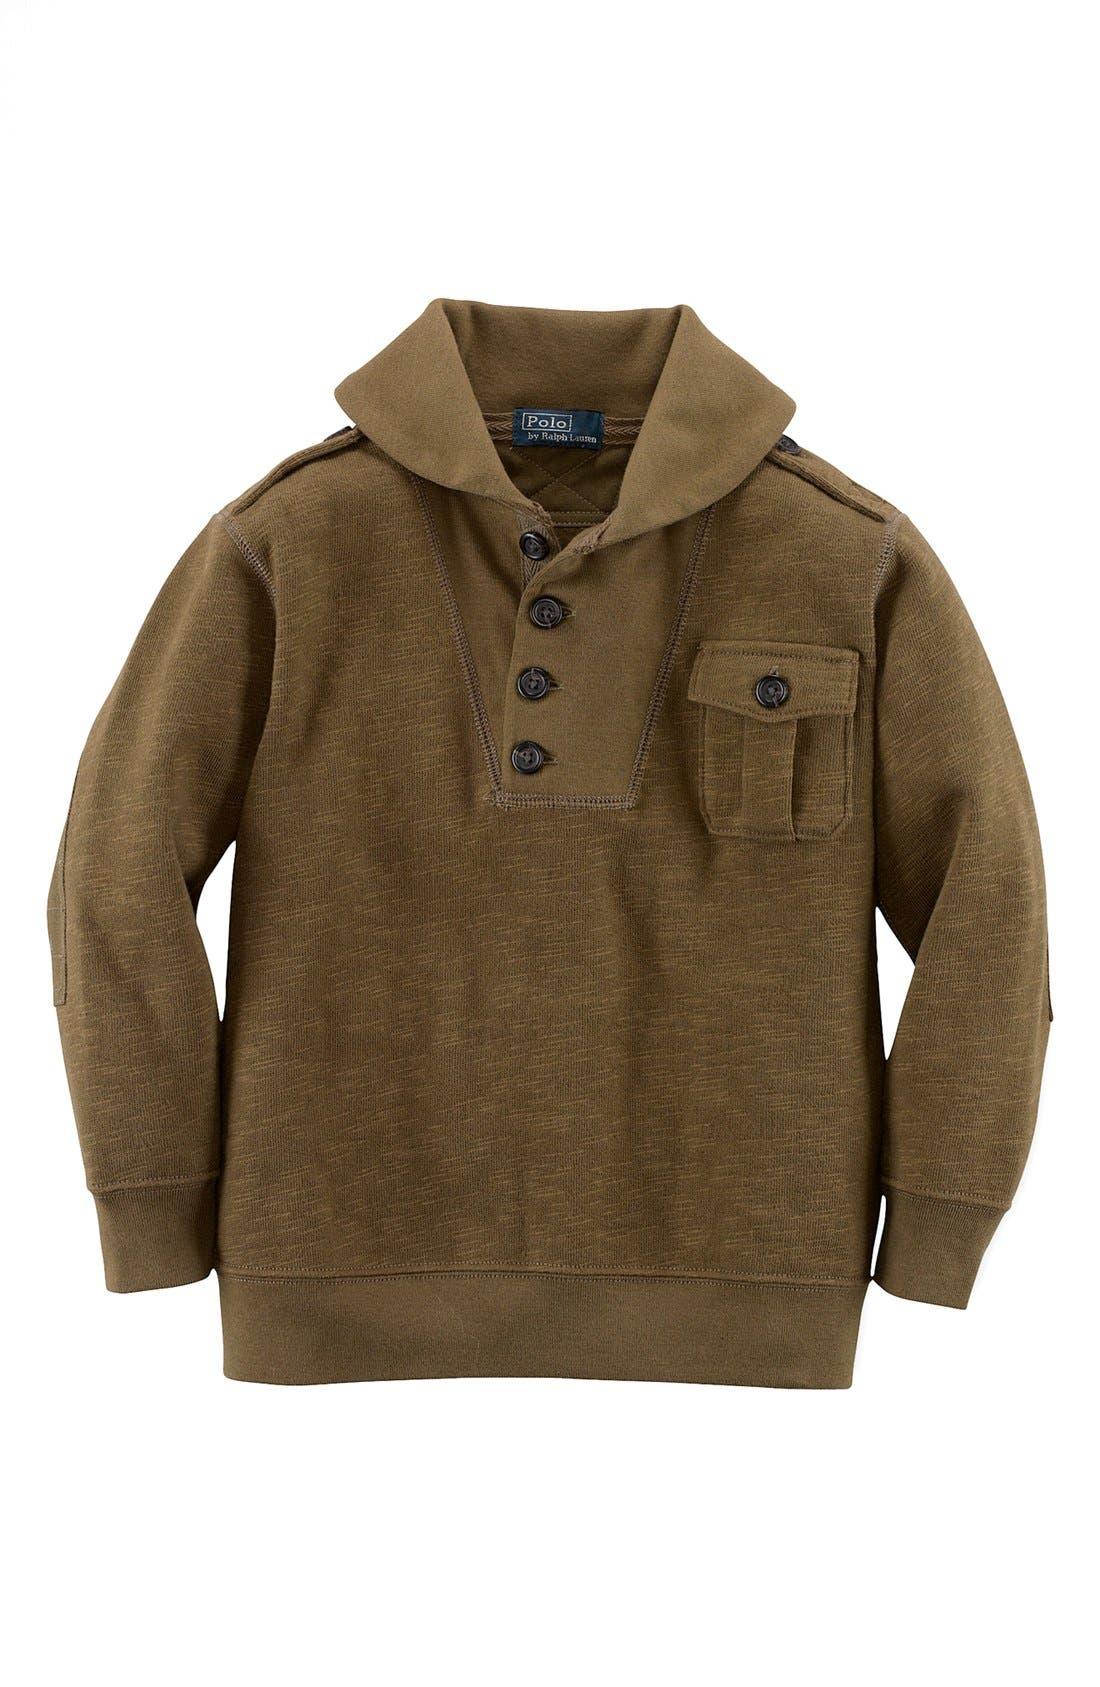 Alternate Image 1 Selected - Ralph Lauren Shawl Collar Pullover (Toddler Boys)